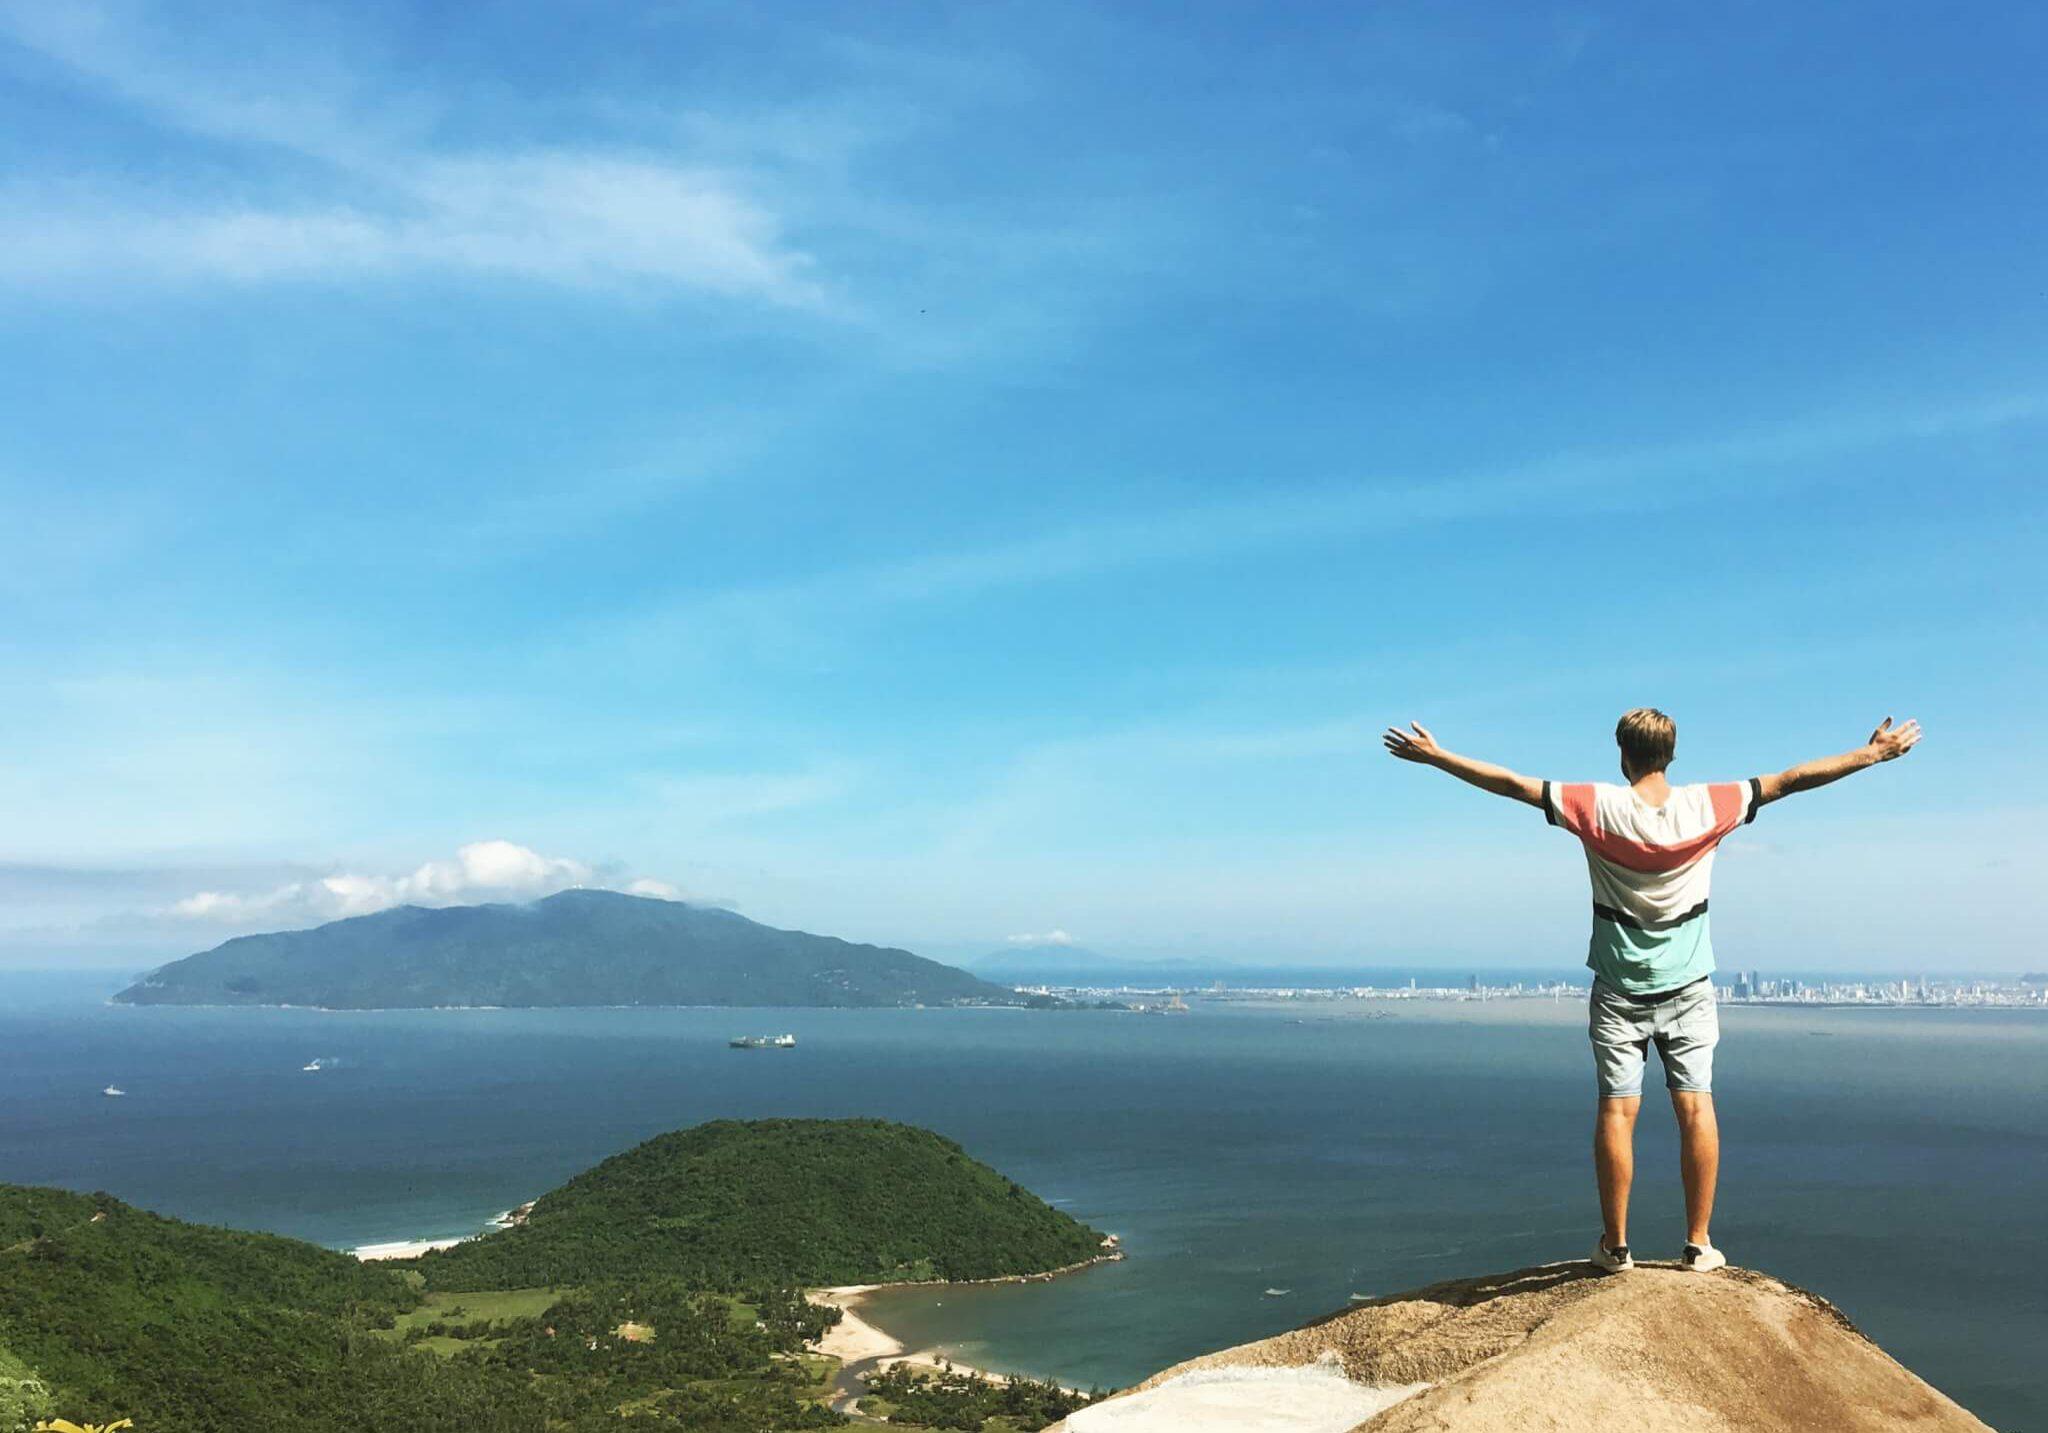 alleen op reis - Sem Hai van Pass